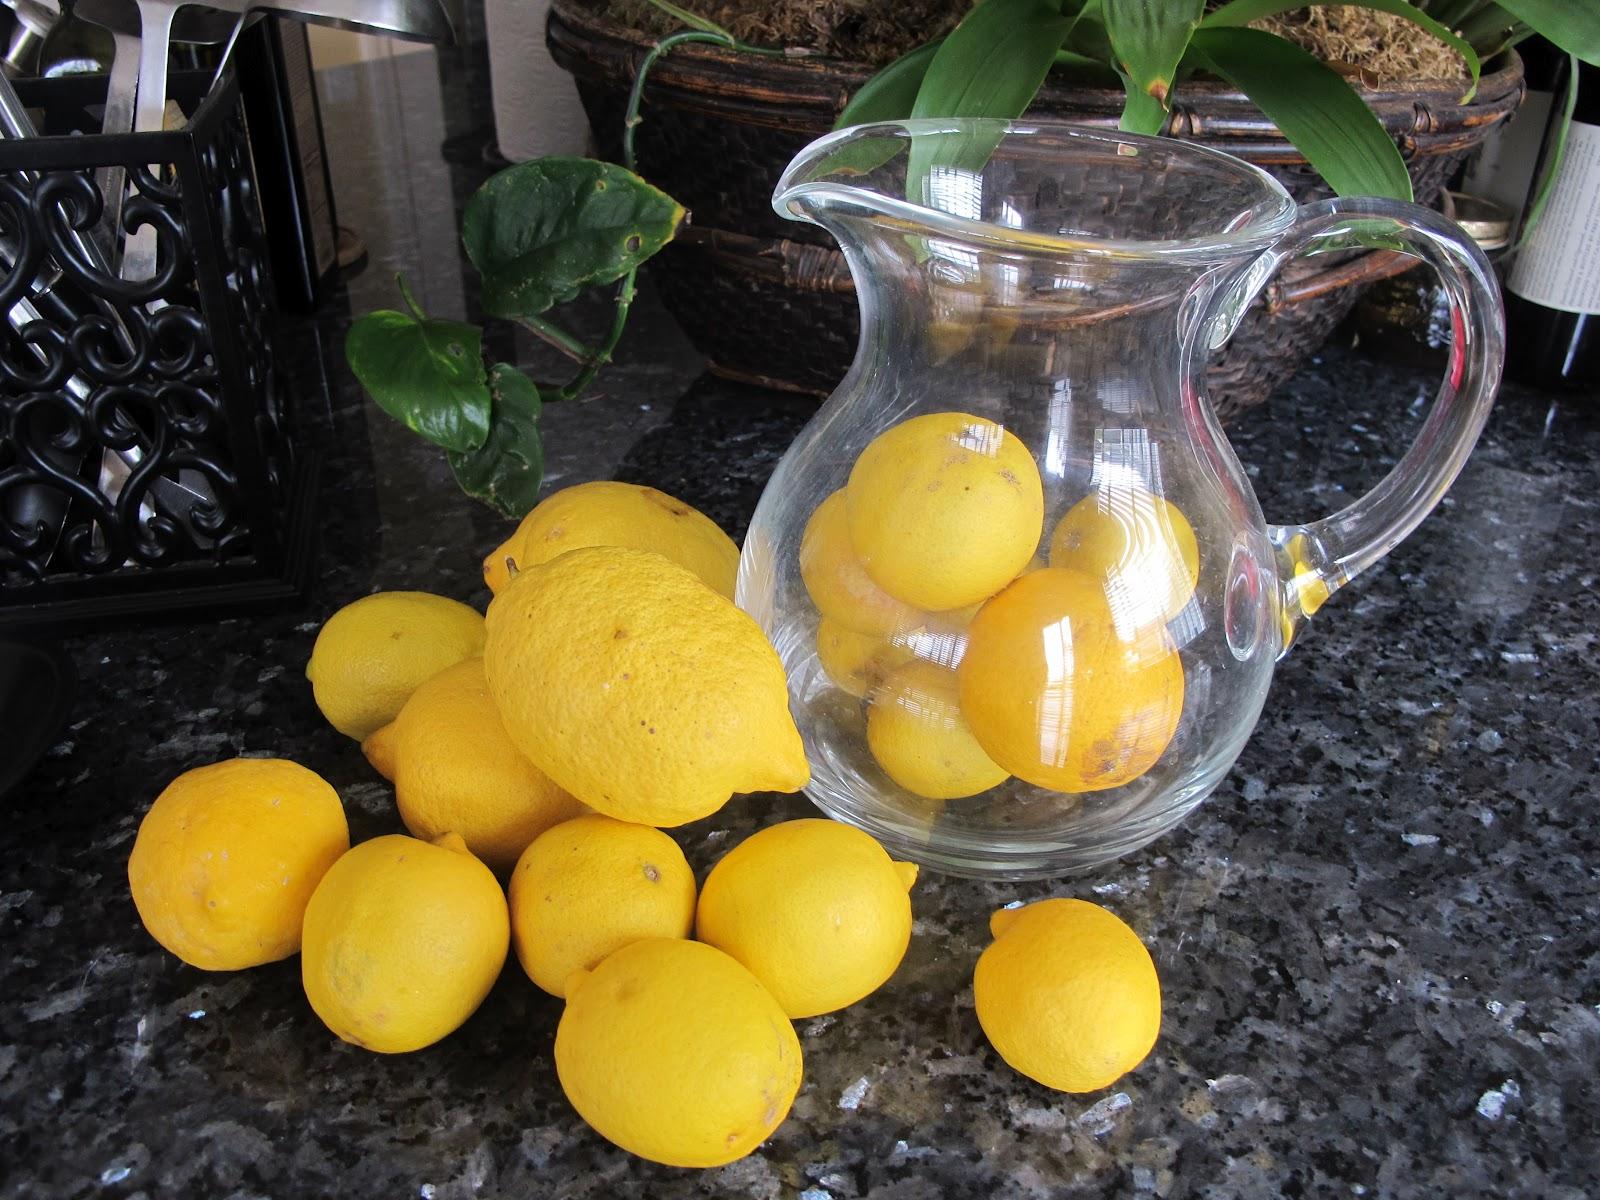 ... best lemonade ever i have never had luck making lemonade i could never